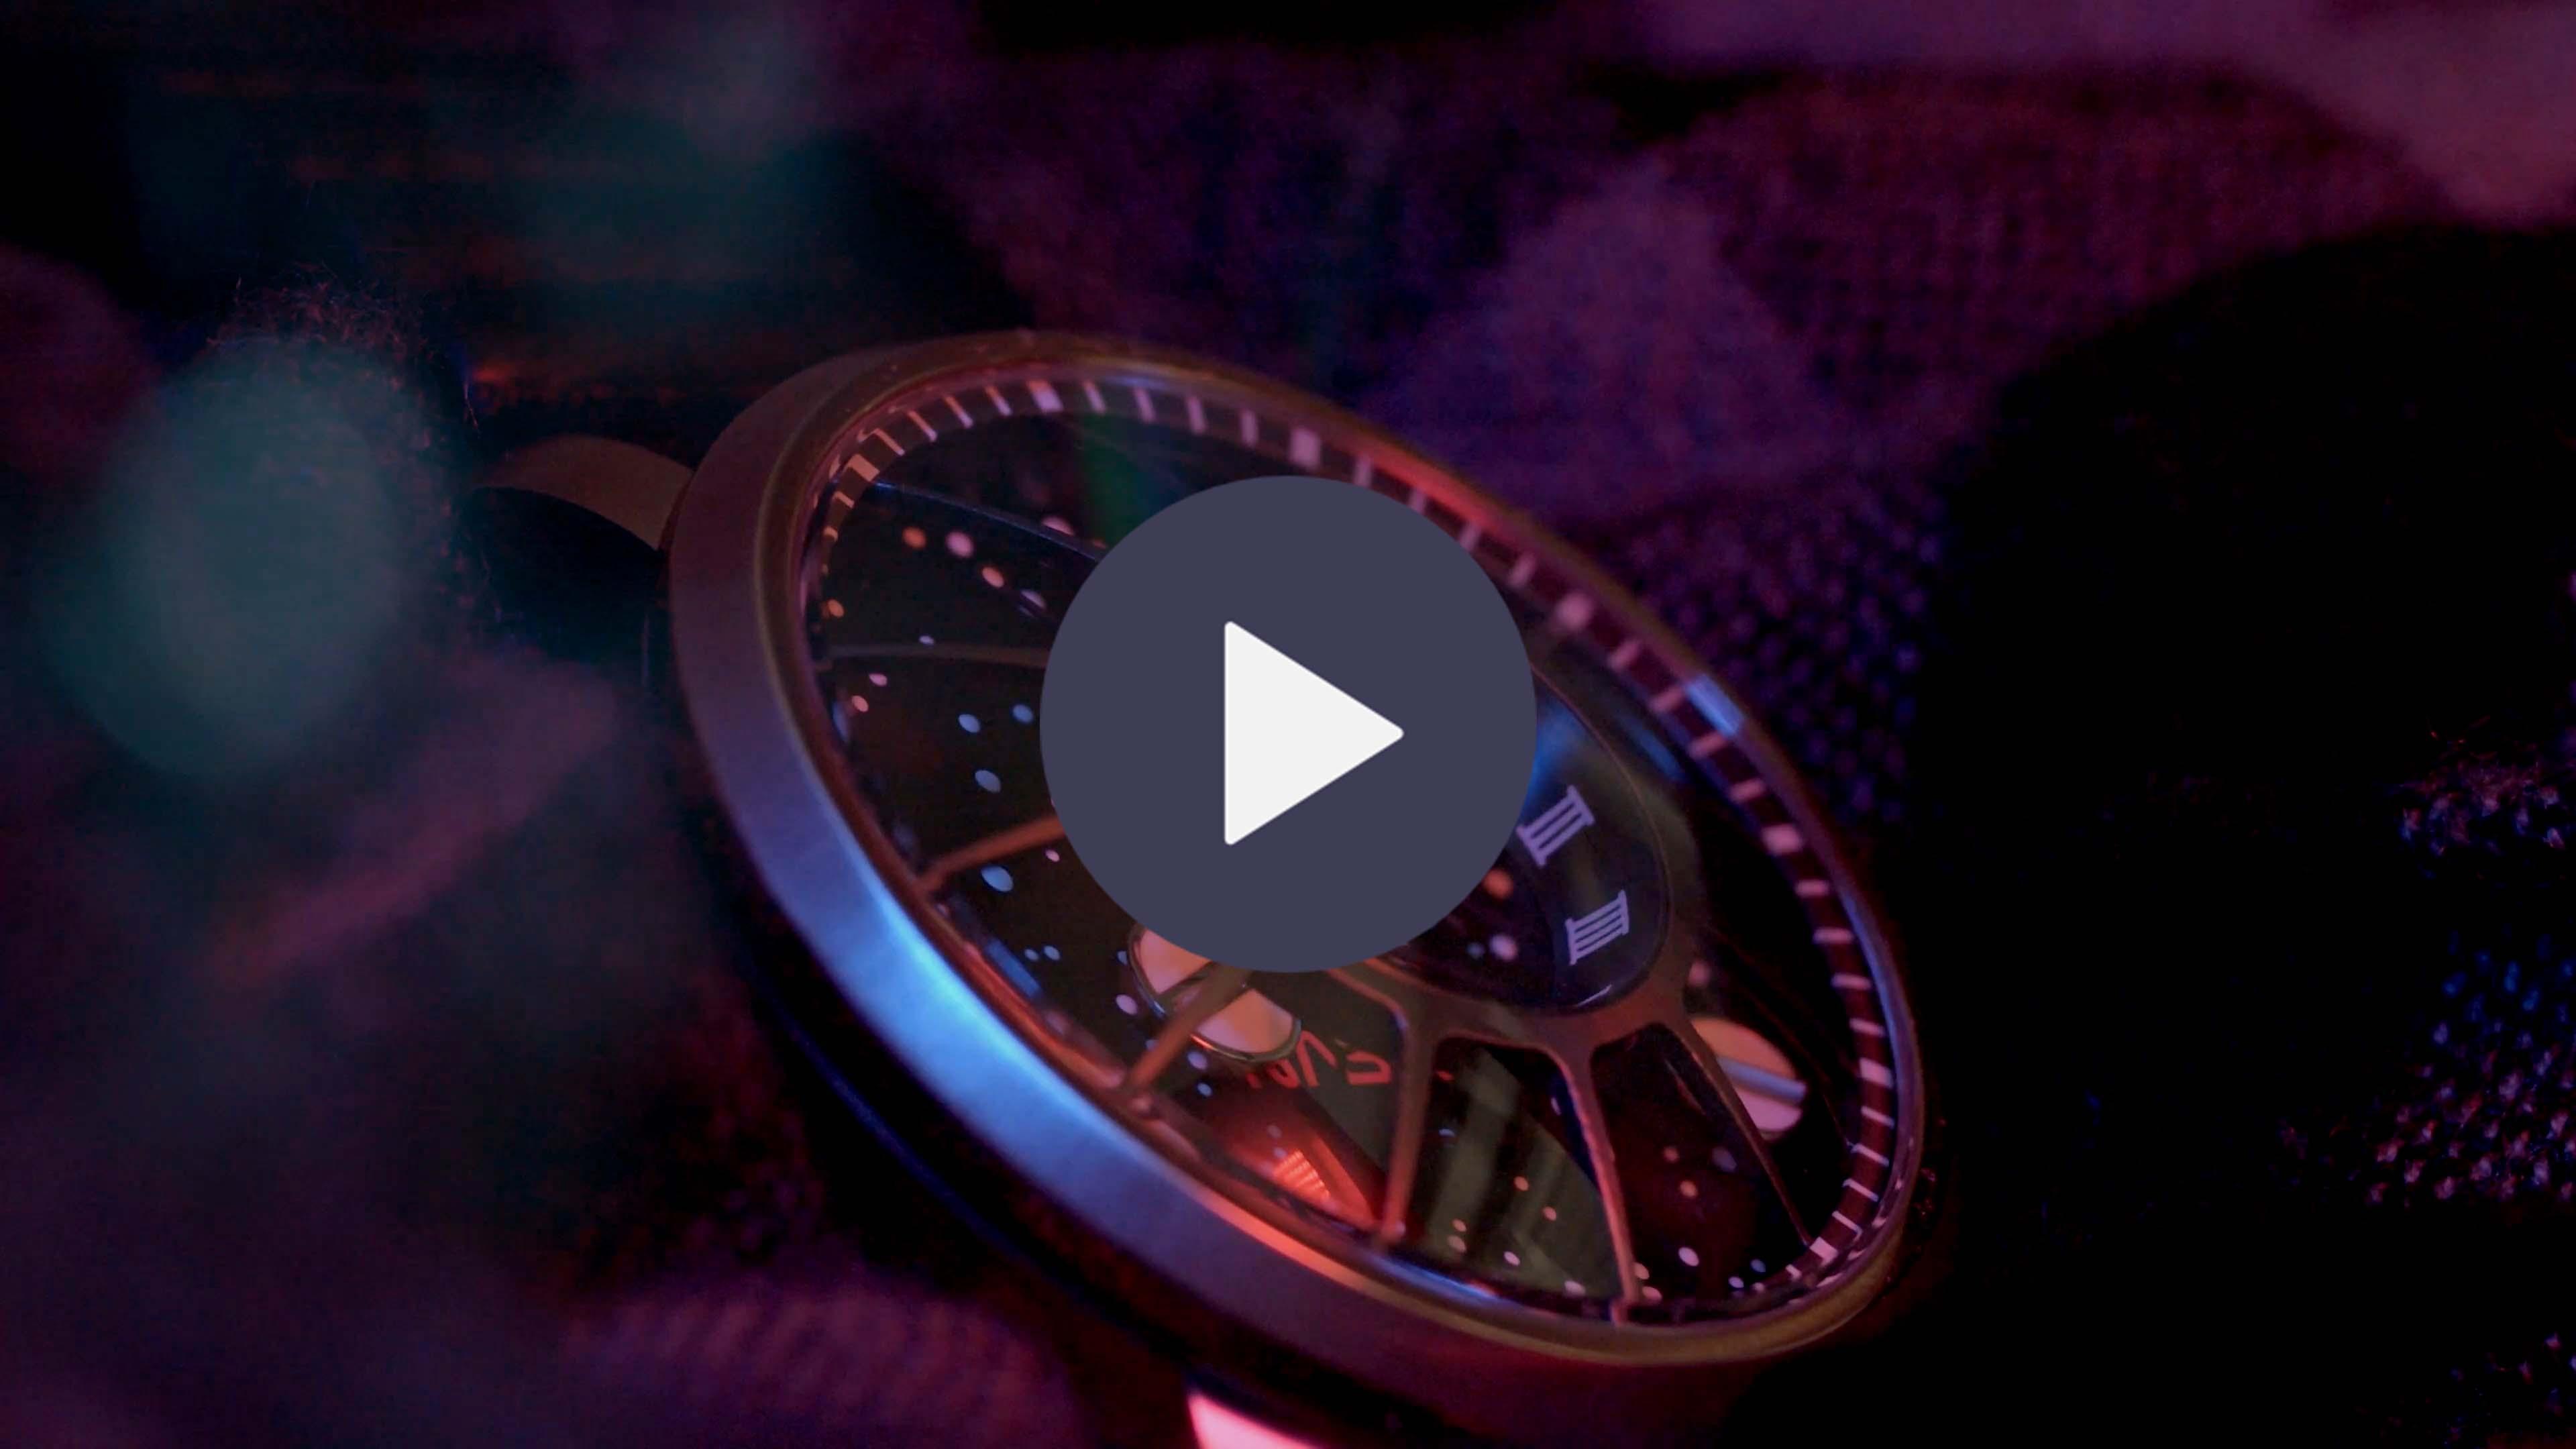 Thumbnail des Xeric Nasa Watch Produktvideos